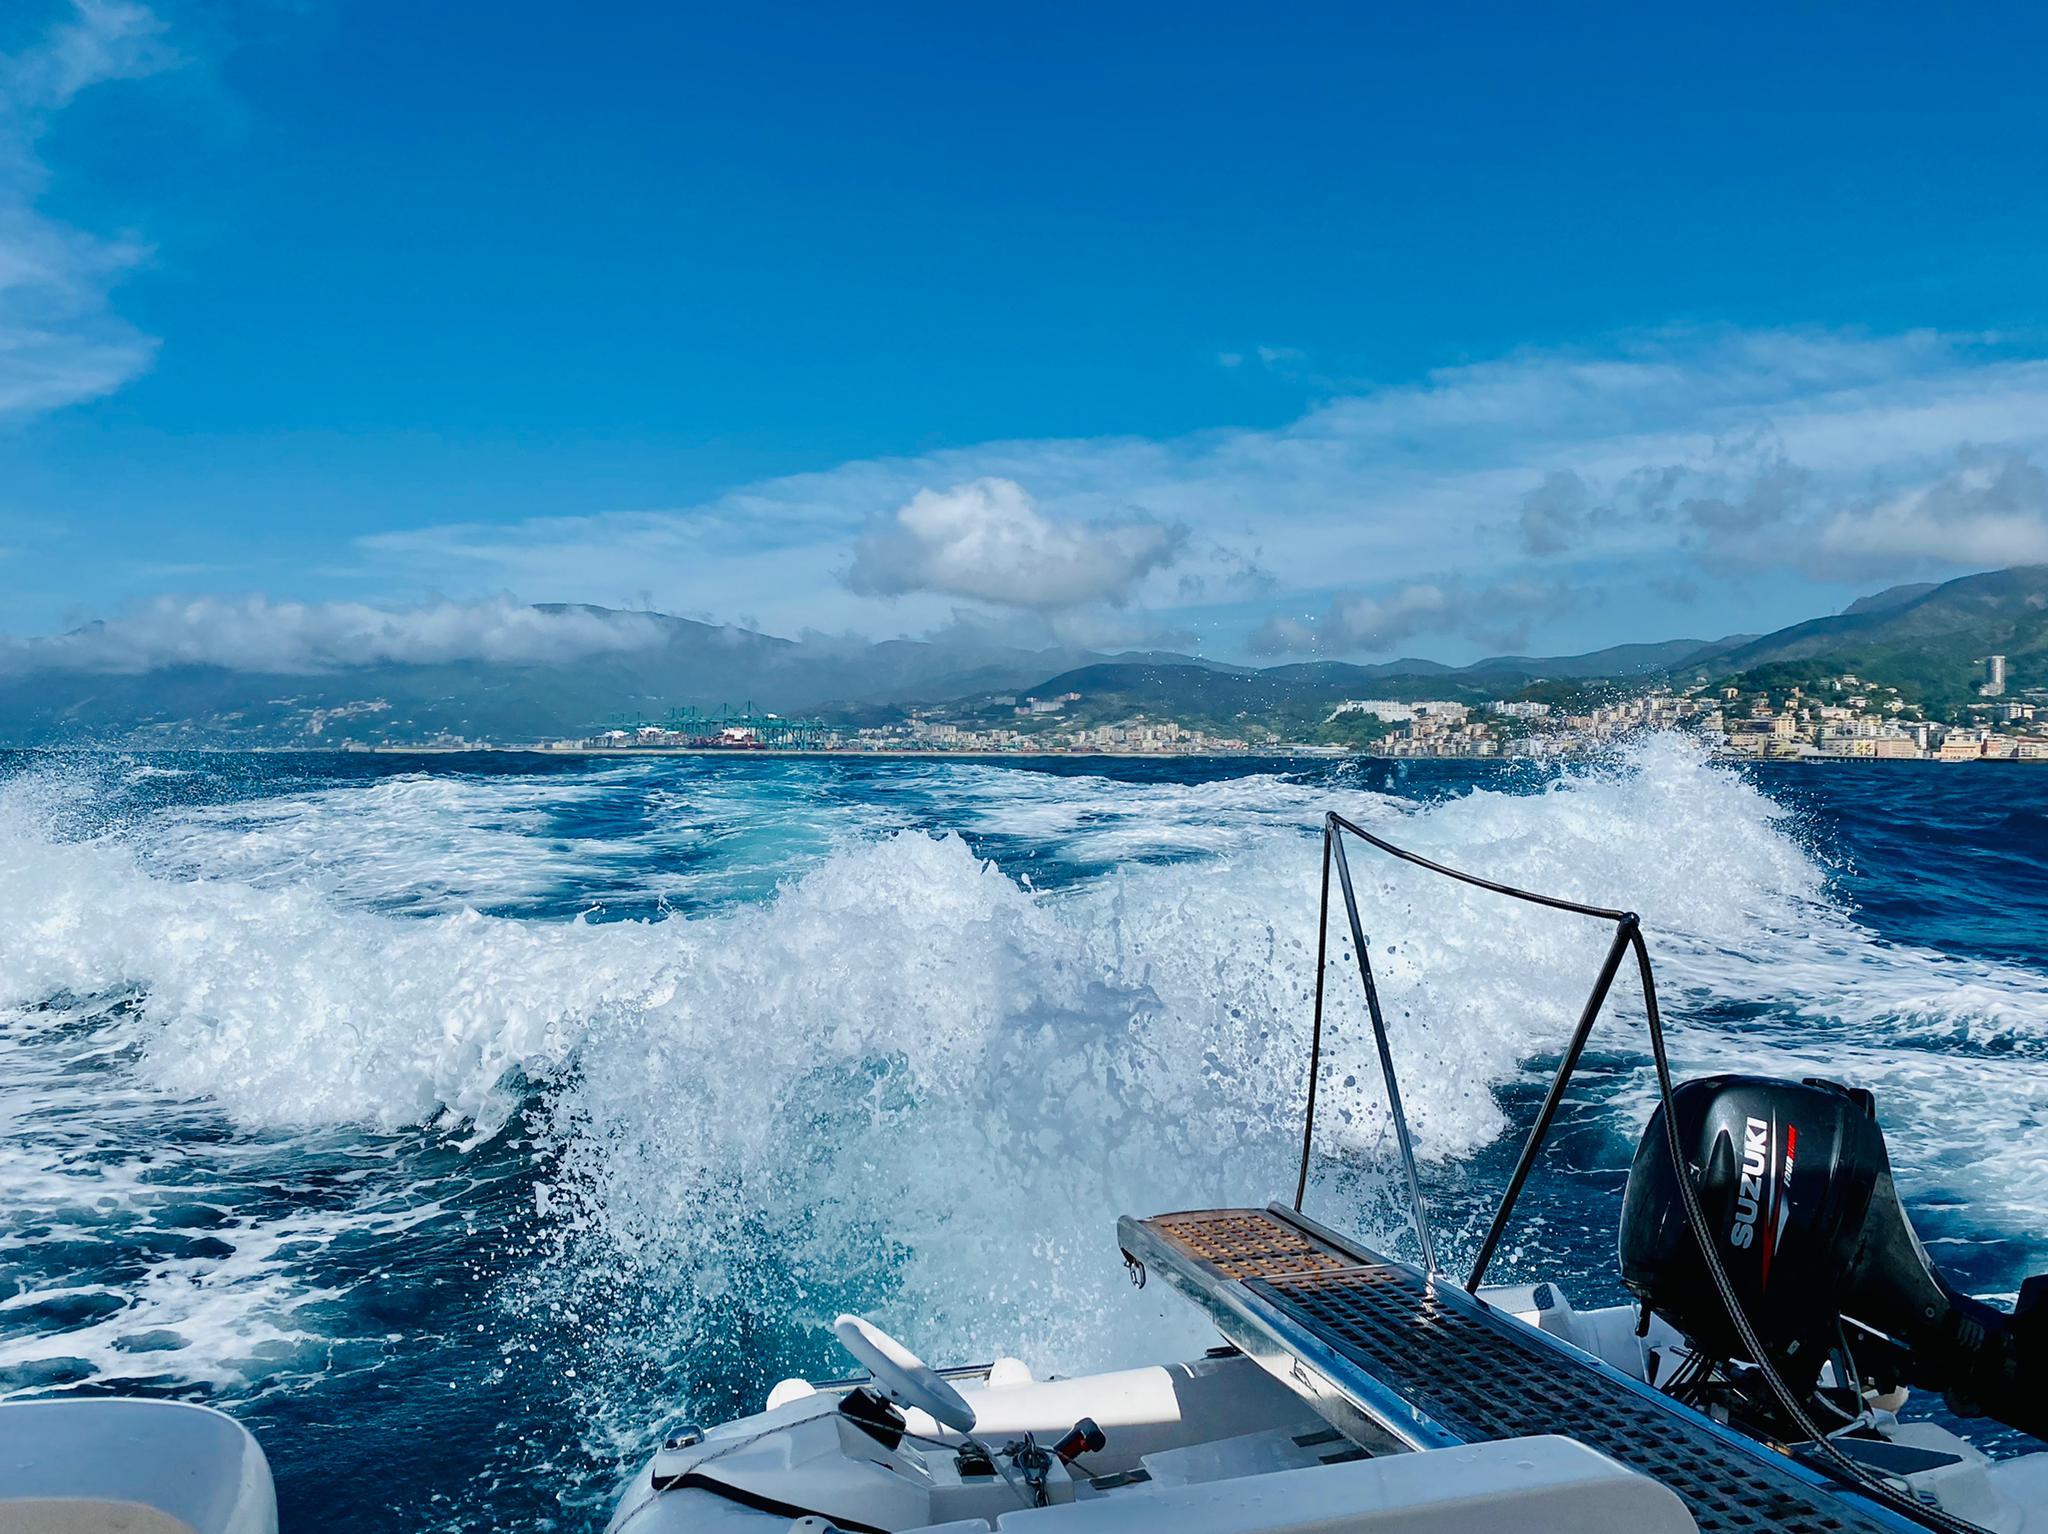 Meilentörns Yacht in voller Fahrt